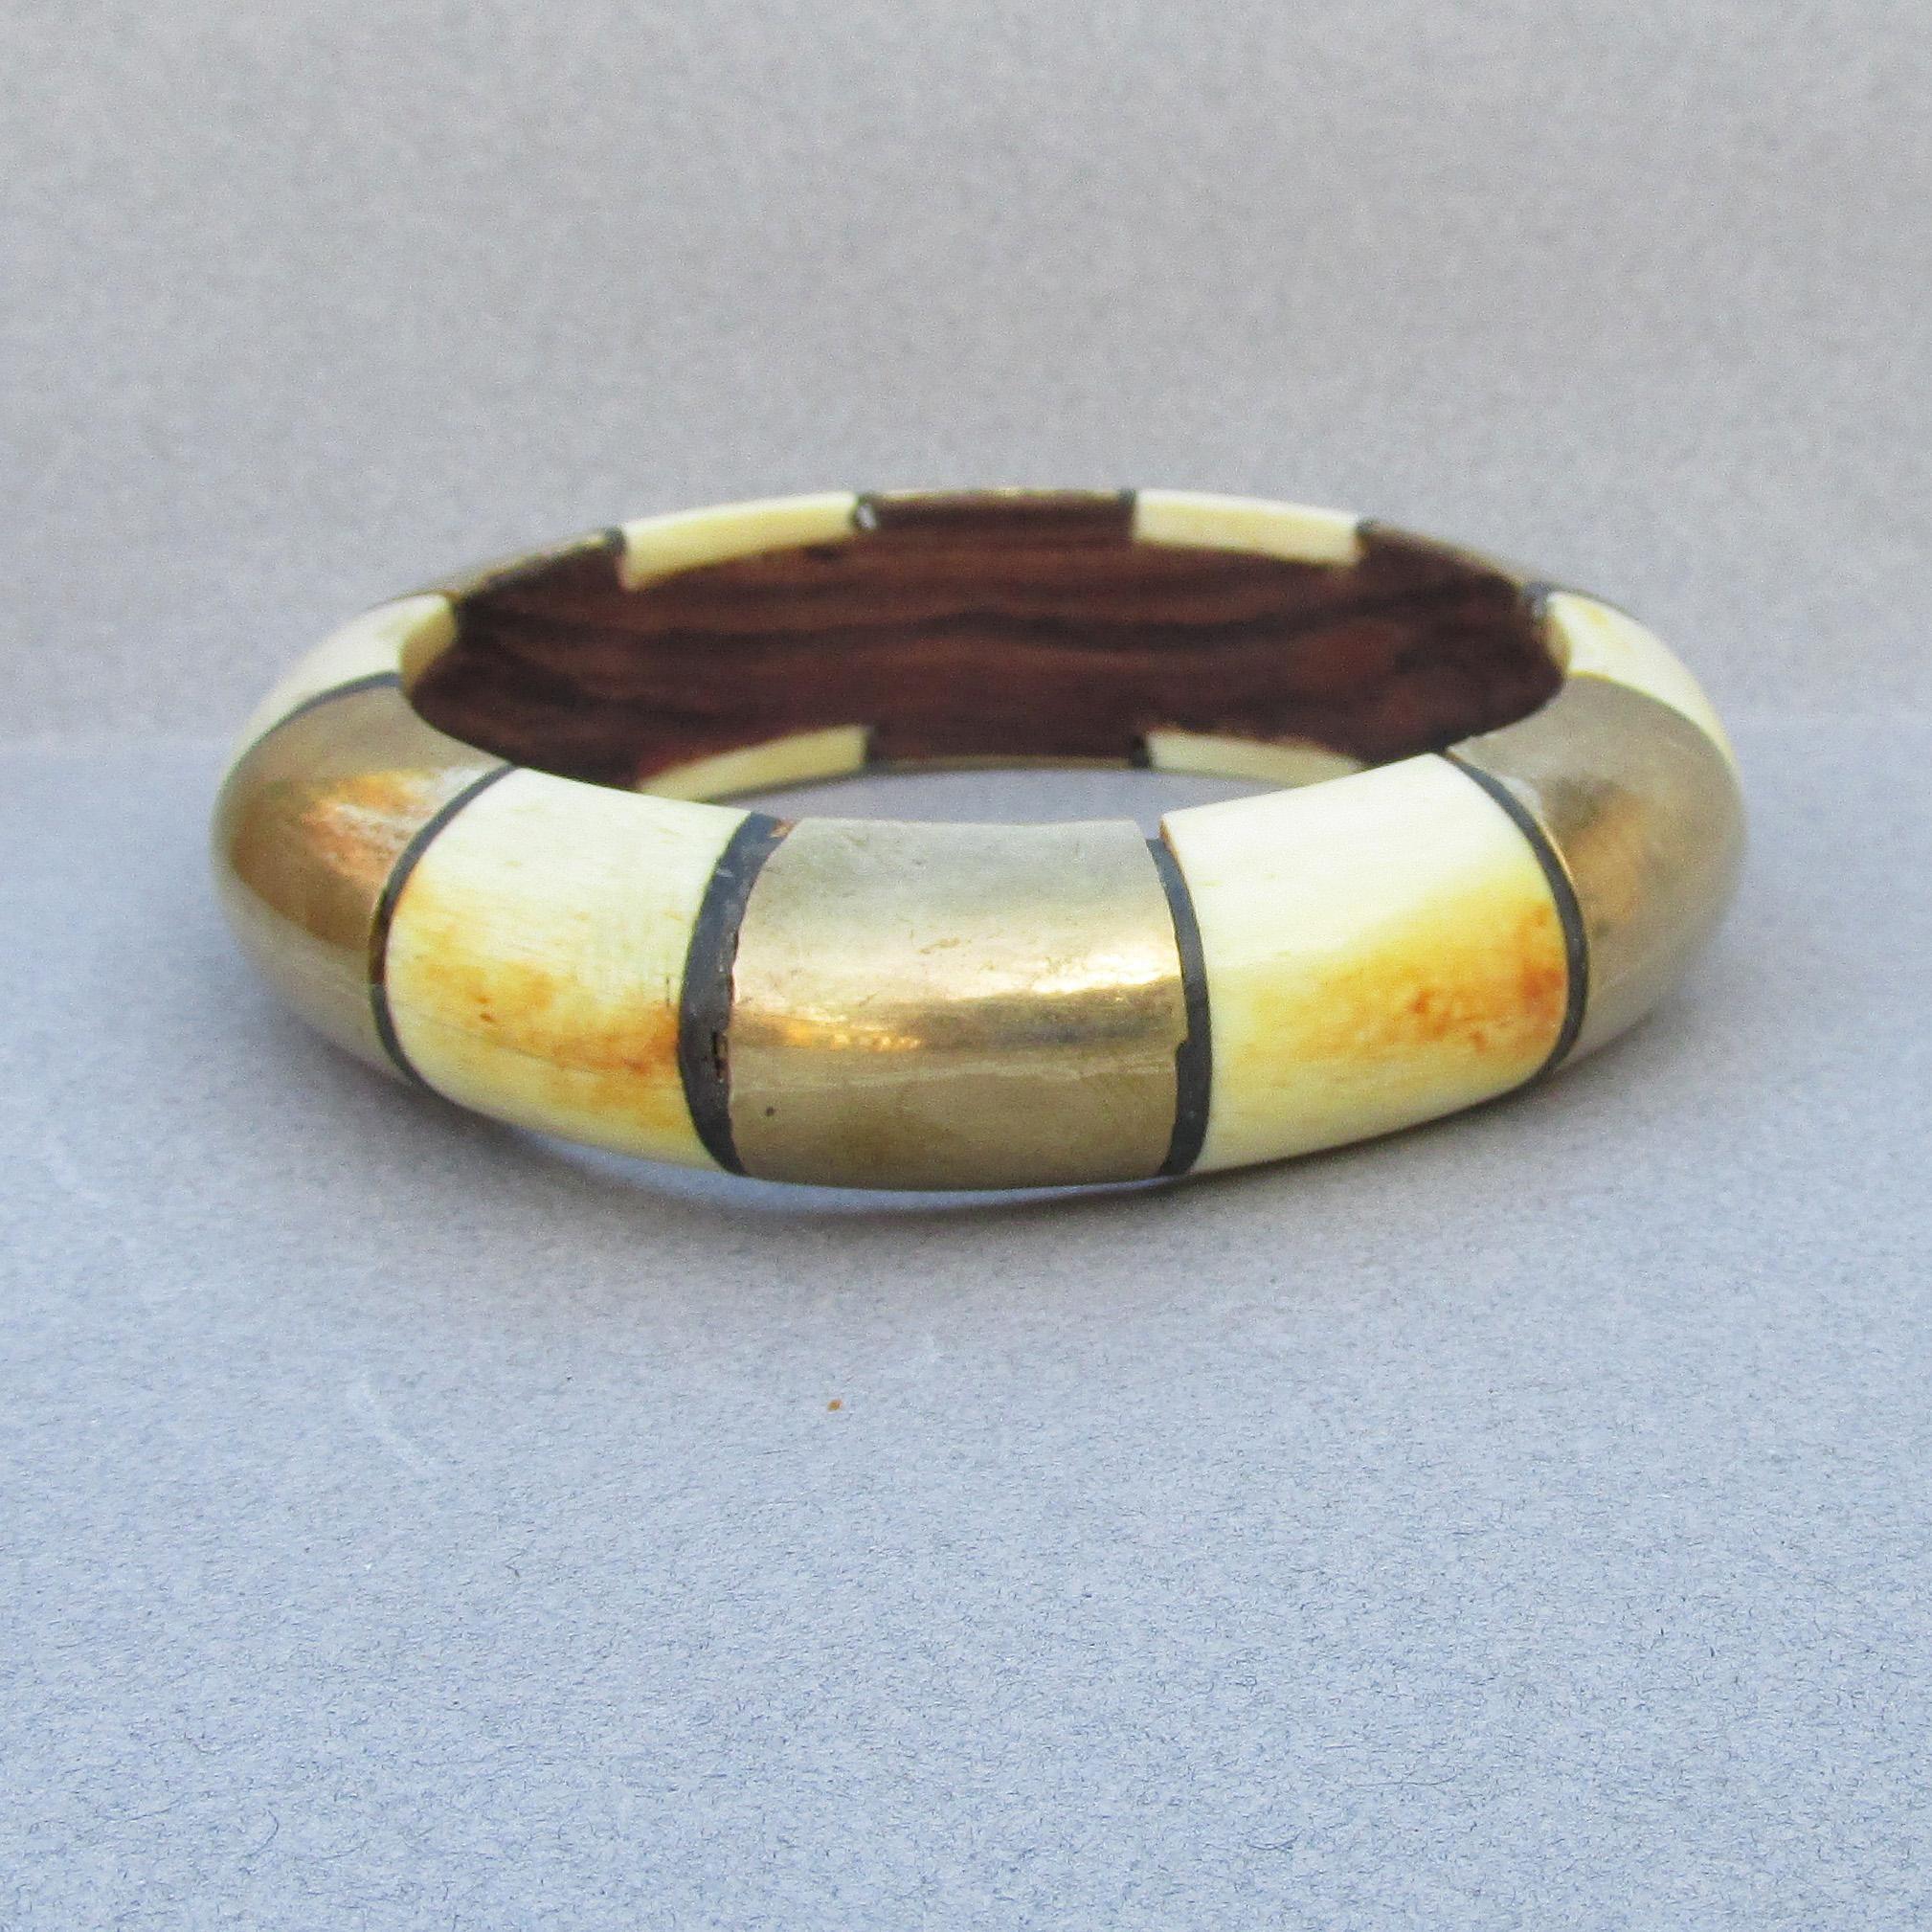 1970s bangle bracelet brass with bone inlay bangle